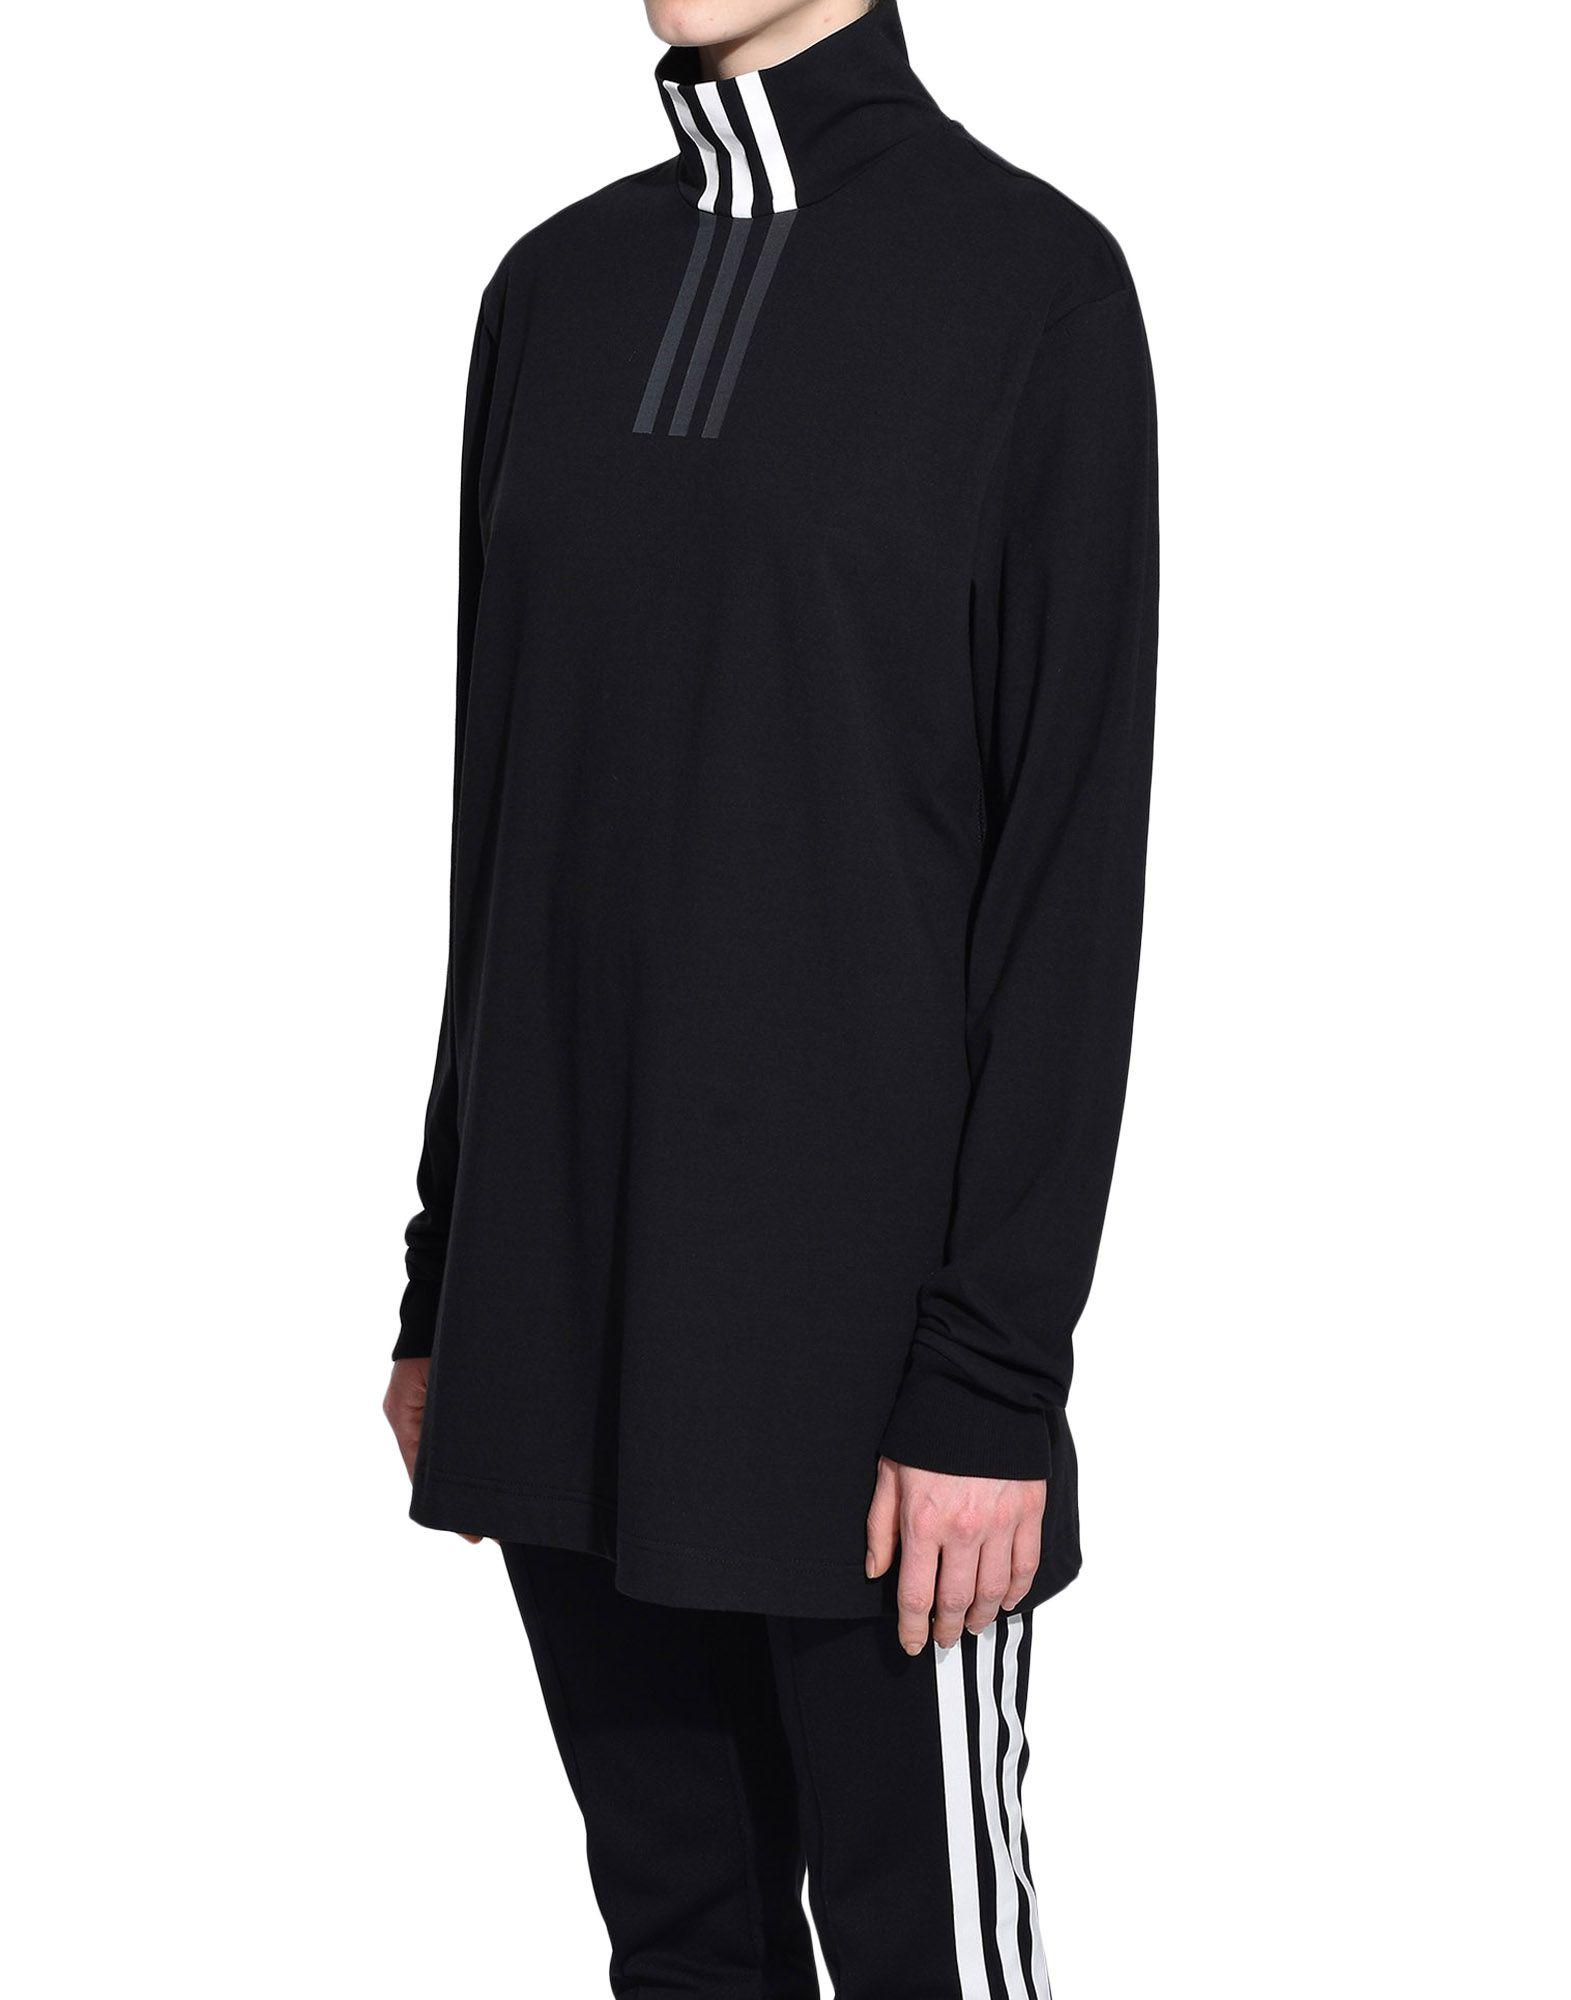 Y-3 Y-3 3-Stripes High Neck Tee Long sleeve t-shirt Woman e